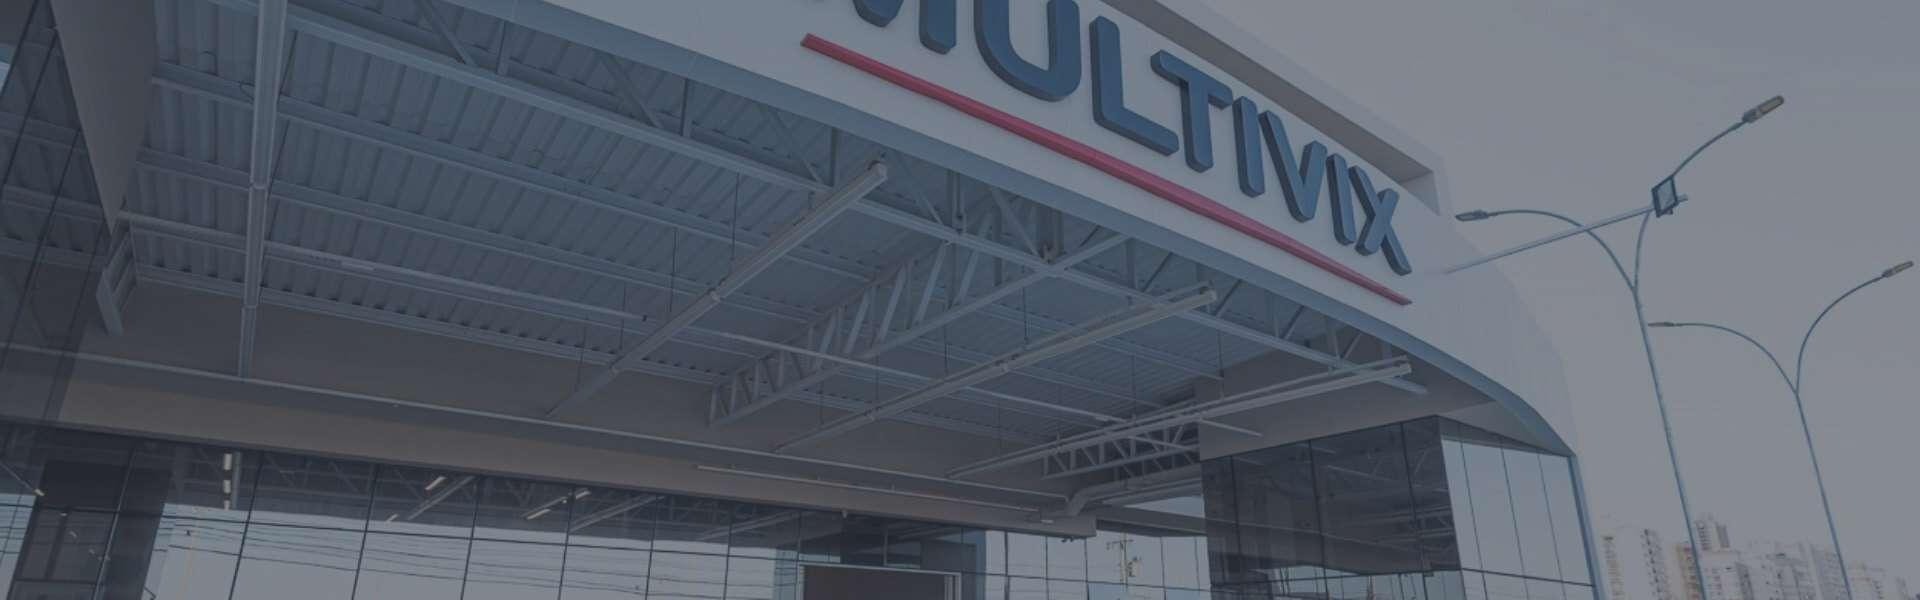 Multivix Vila Velha